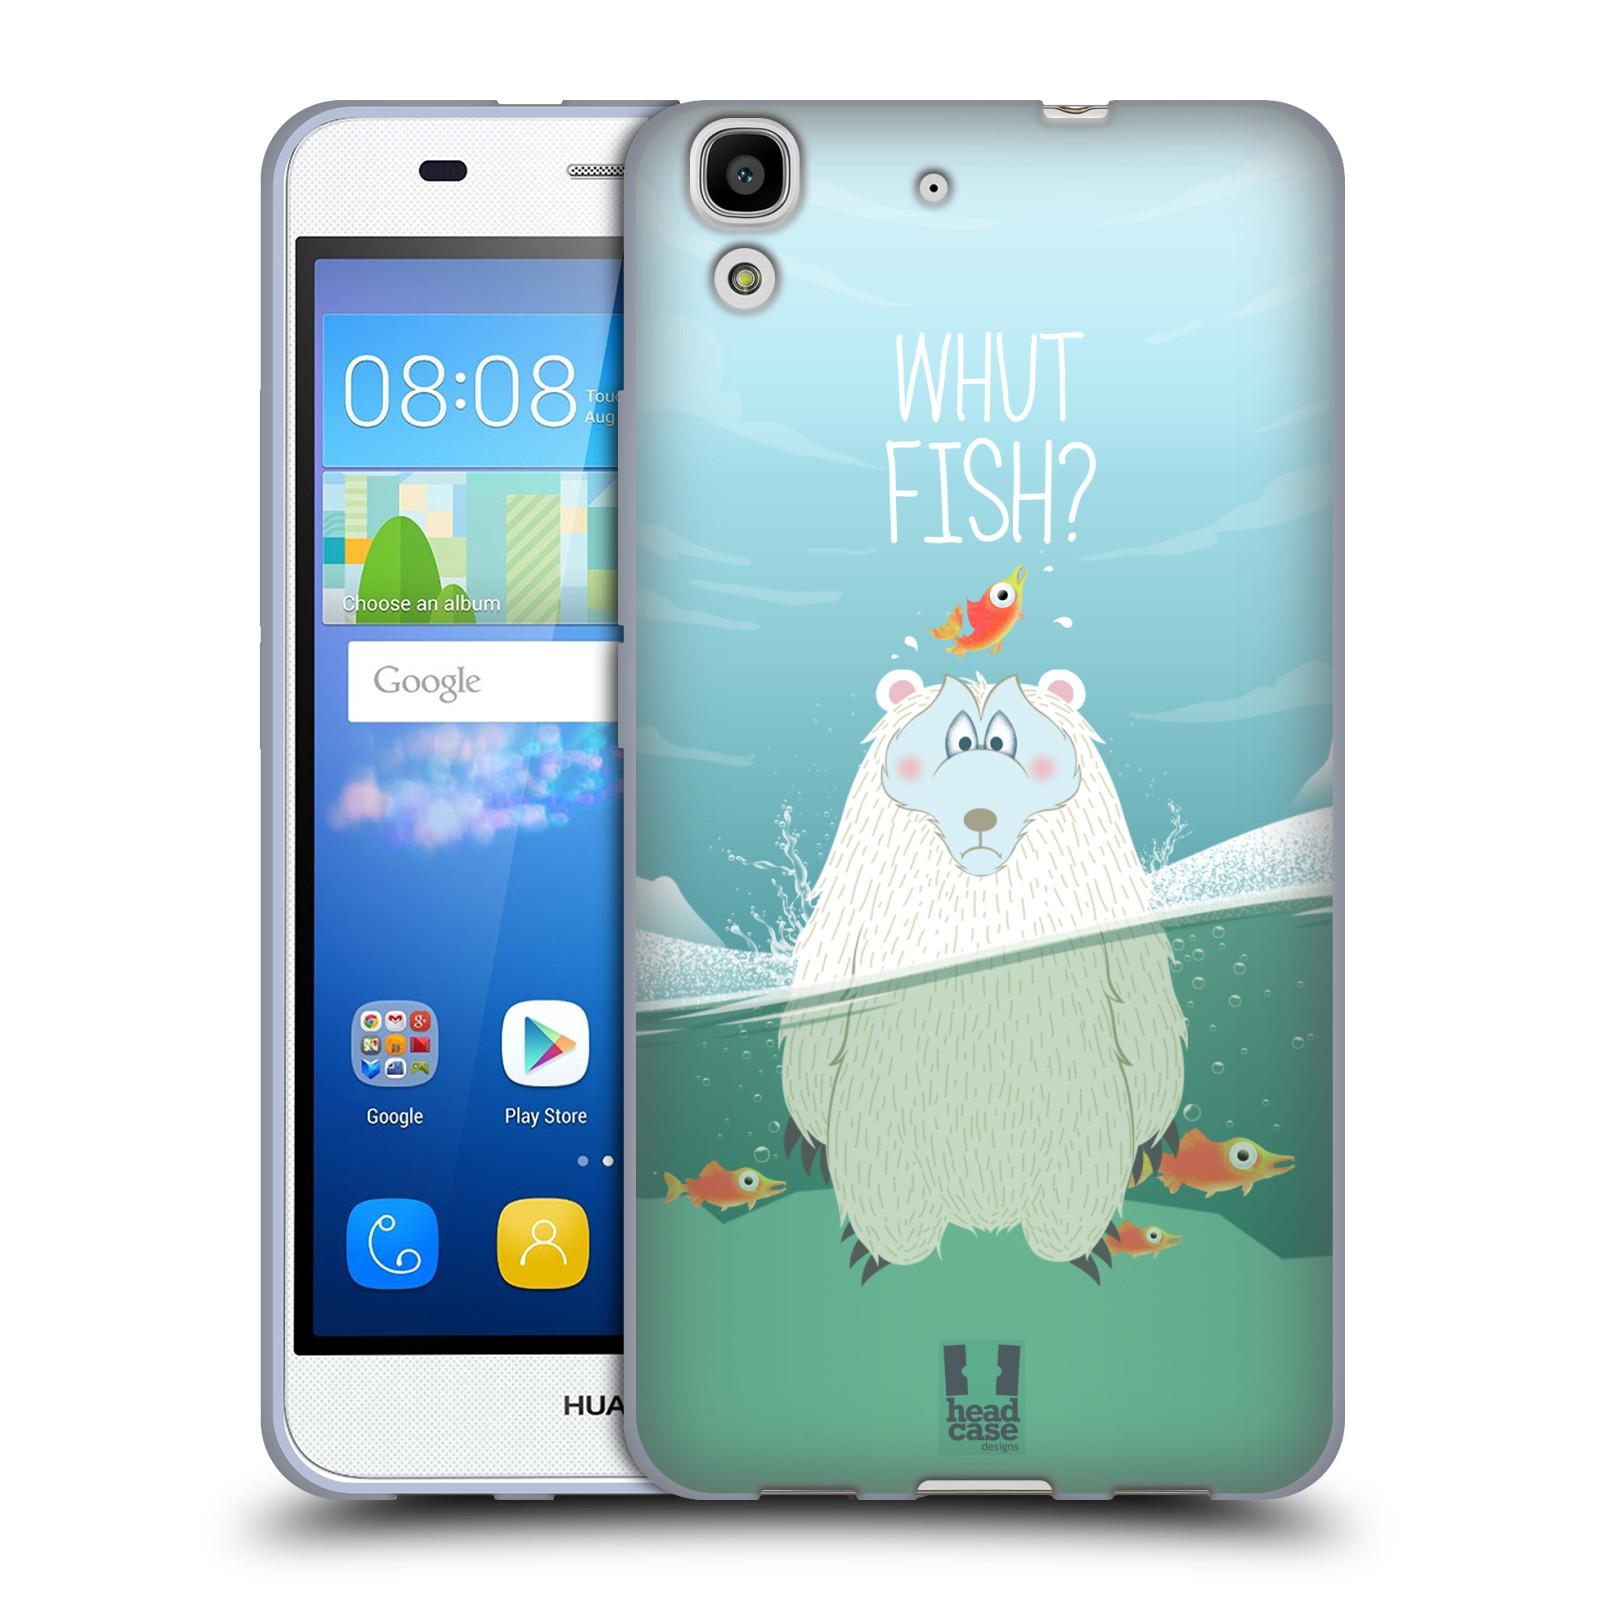 Silikonové pouzdro na mobil Huawei Y6 HEAD CASE Medvěd Whut Fish?